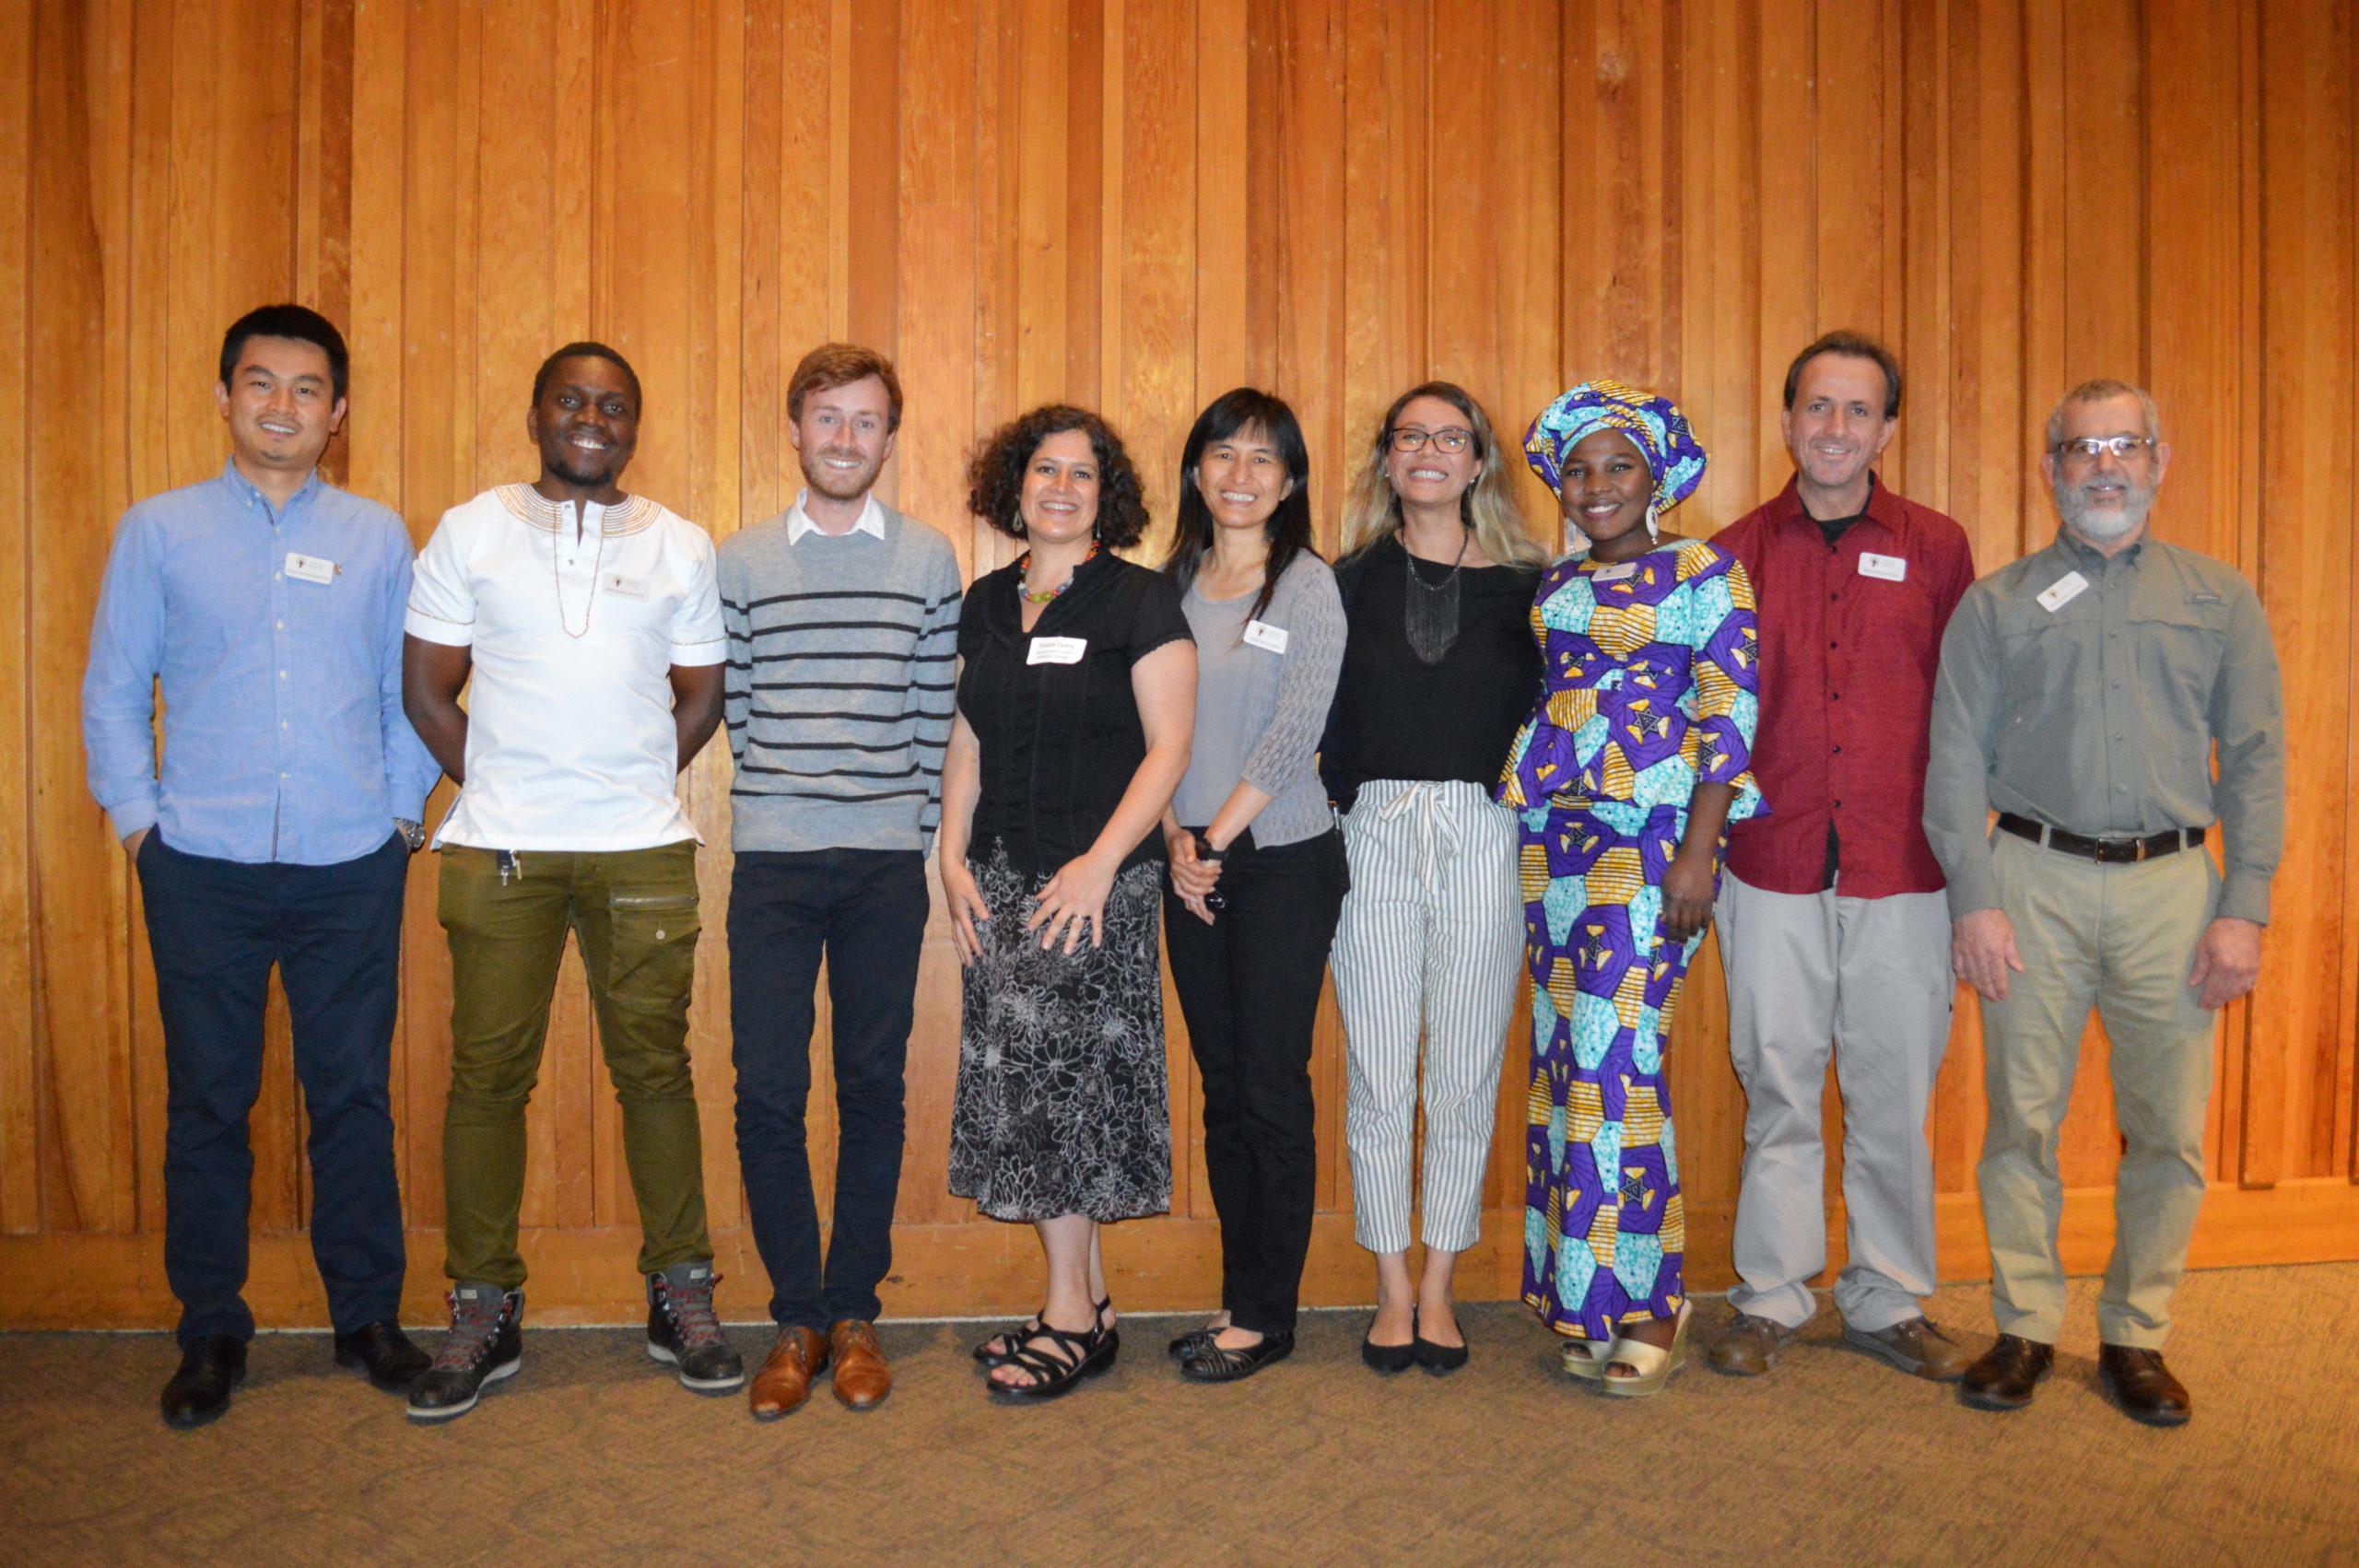 International Fellows pose at an event